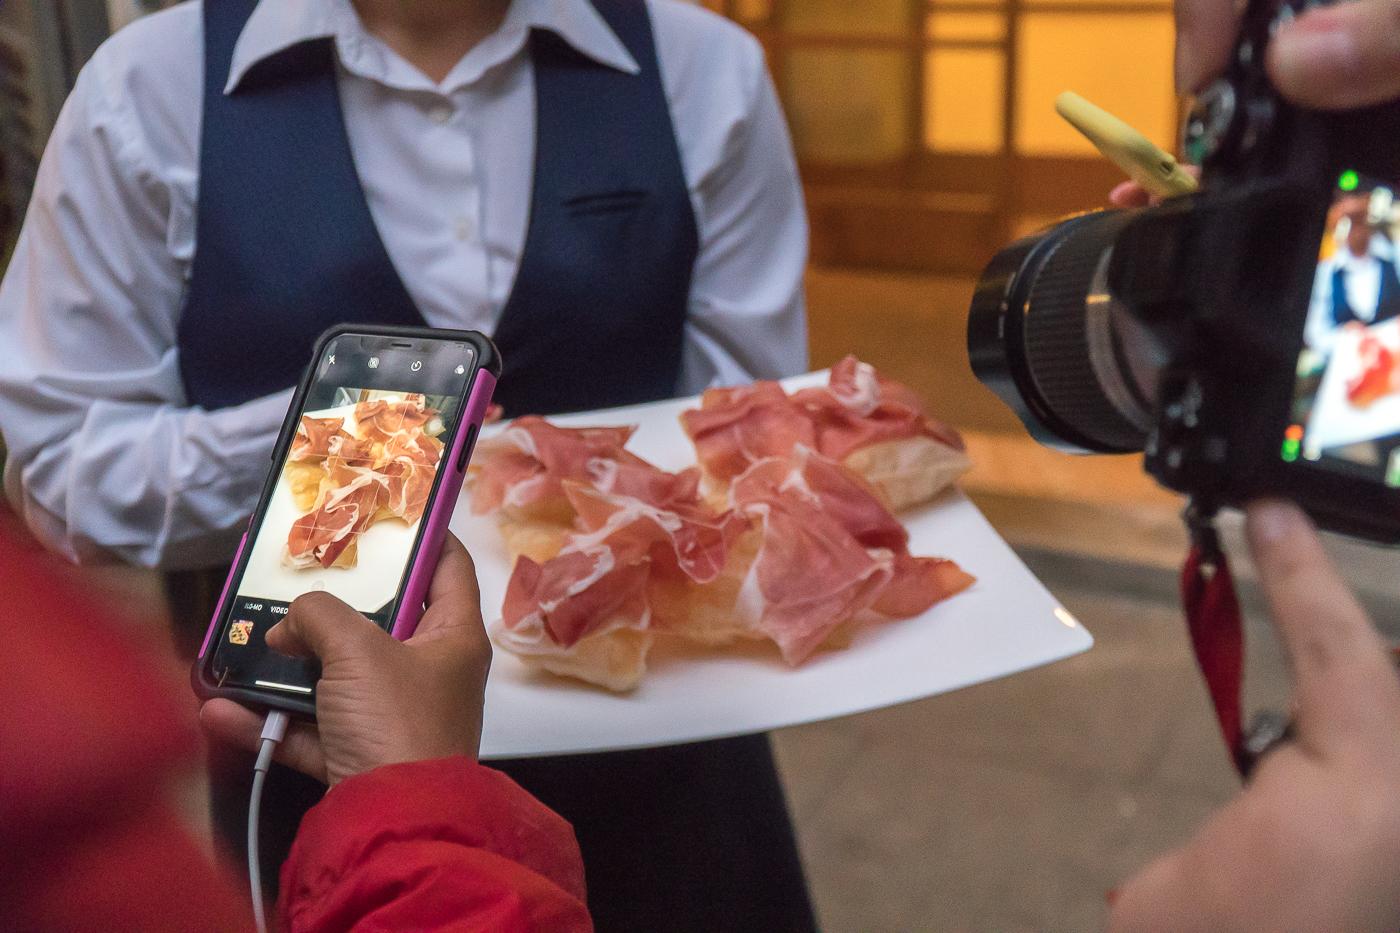 Charcuterie italienne gnocco fritto - Quoi manger en Italie